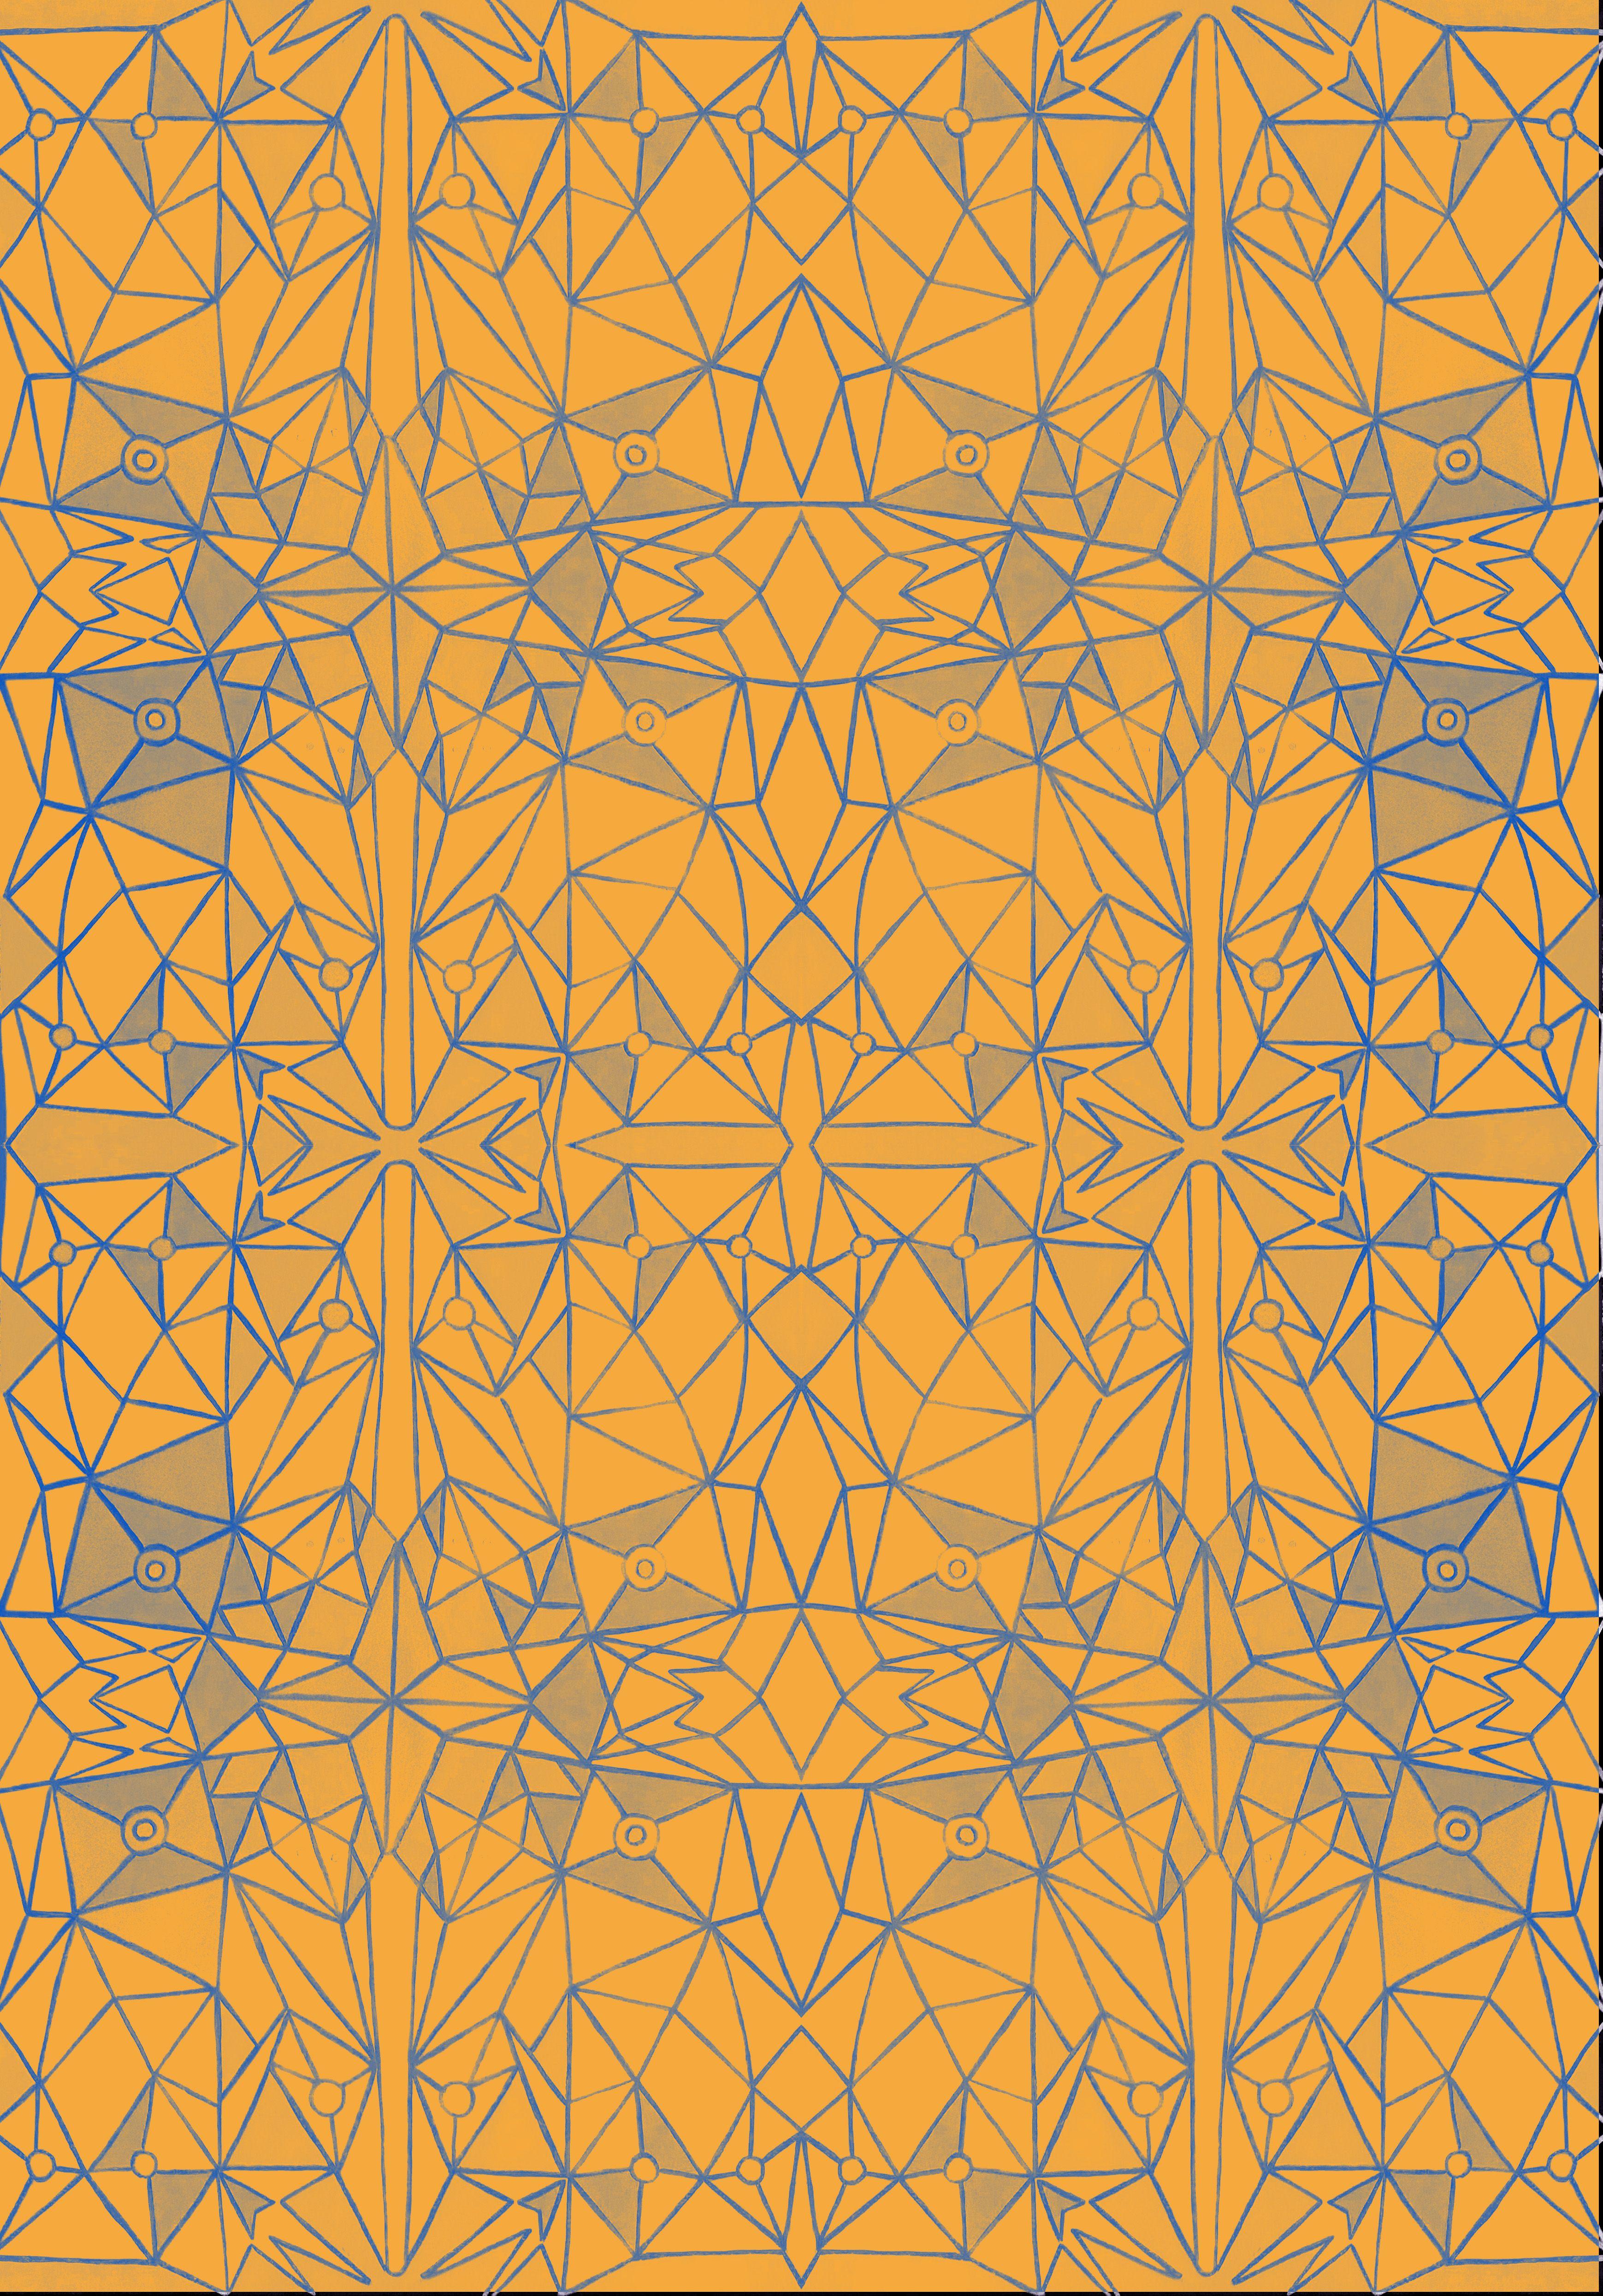 Kaleidoscope Suomi